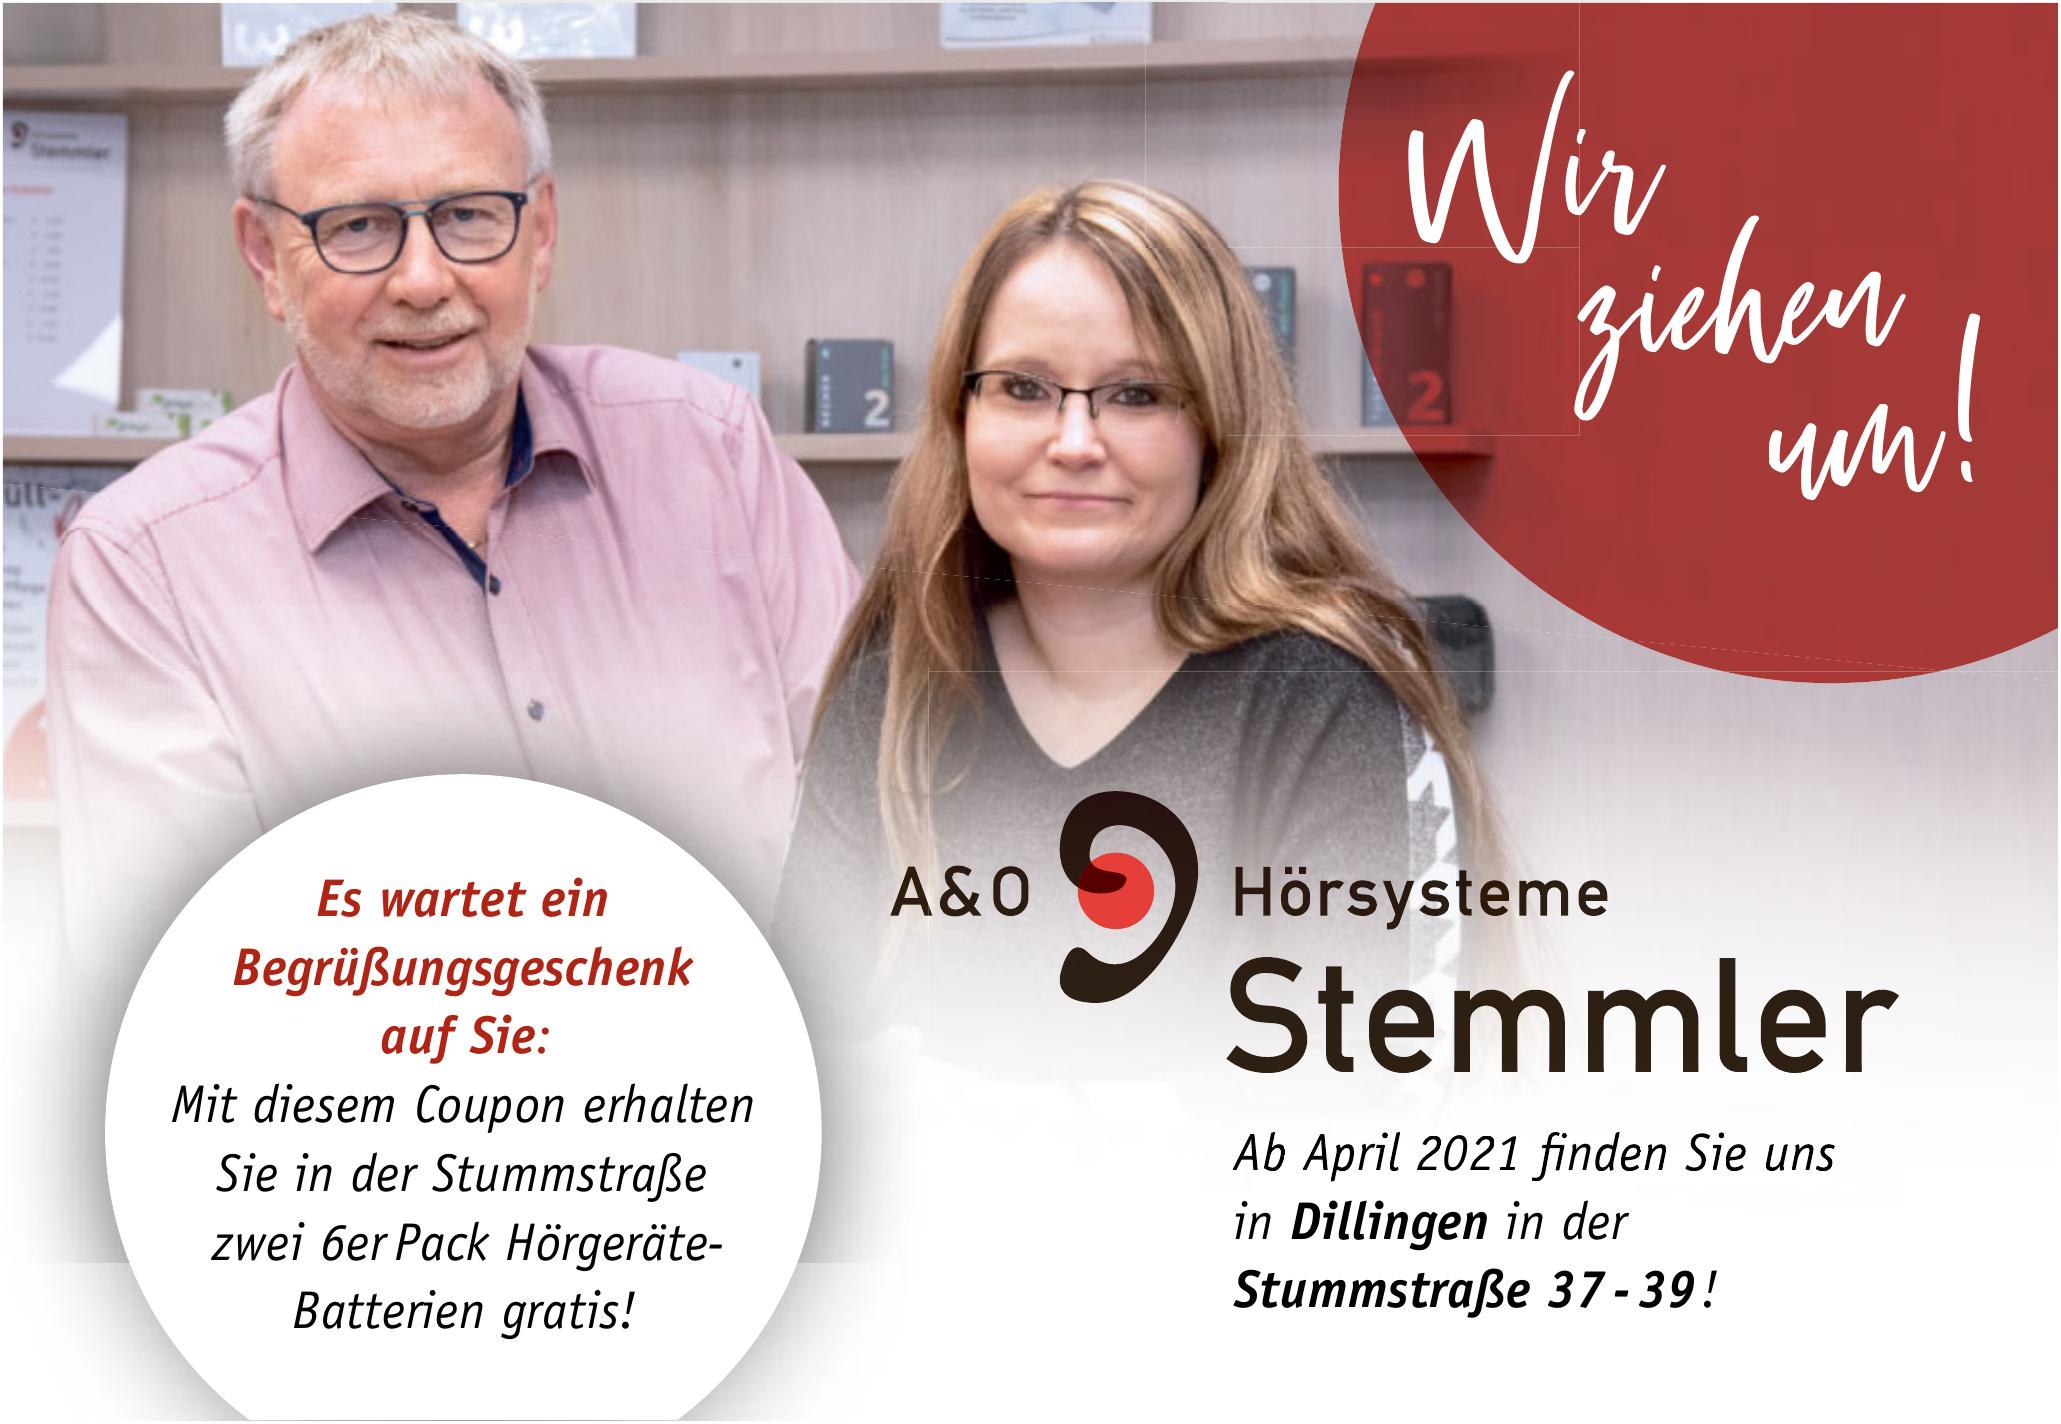 A&O Hörsysteme Stemmler GmbH